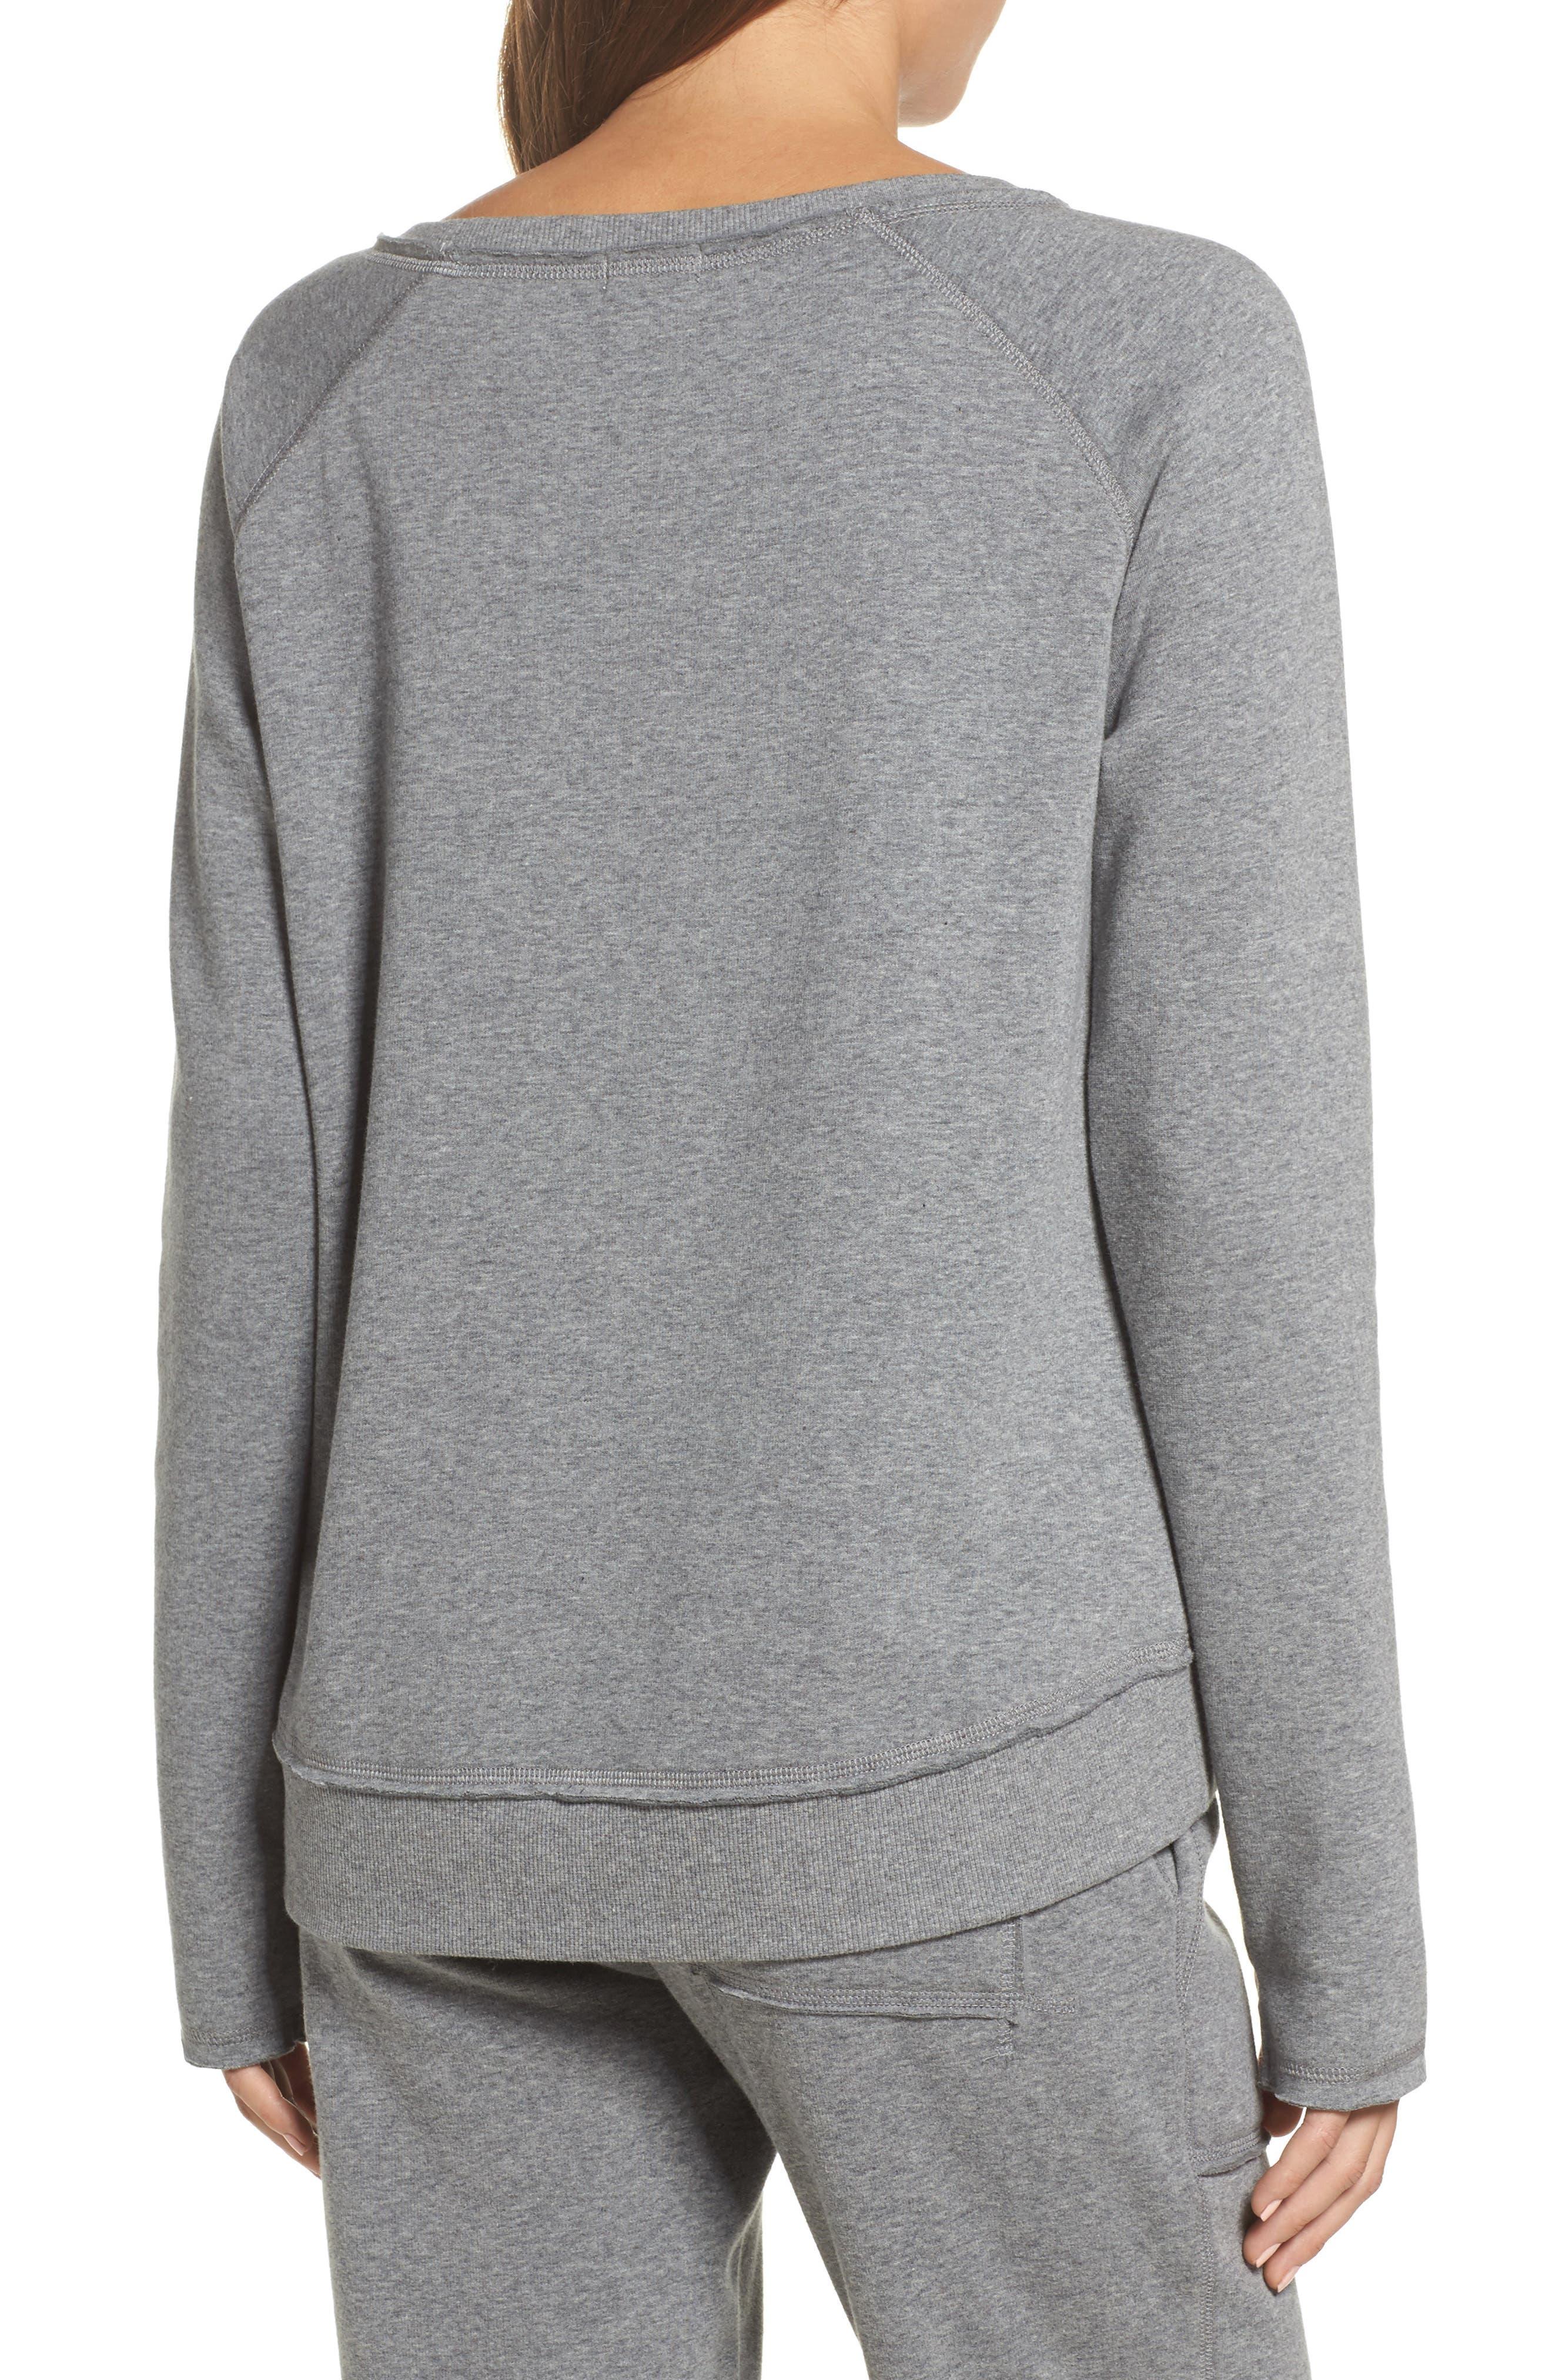 Fleece Sweatshirt,                             Alternate thumbnail 2, color,                             Heather Grey